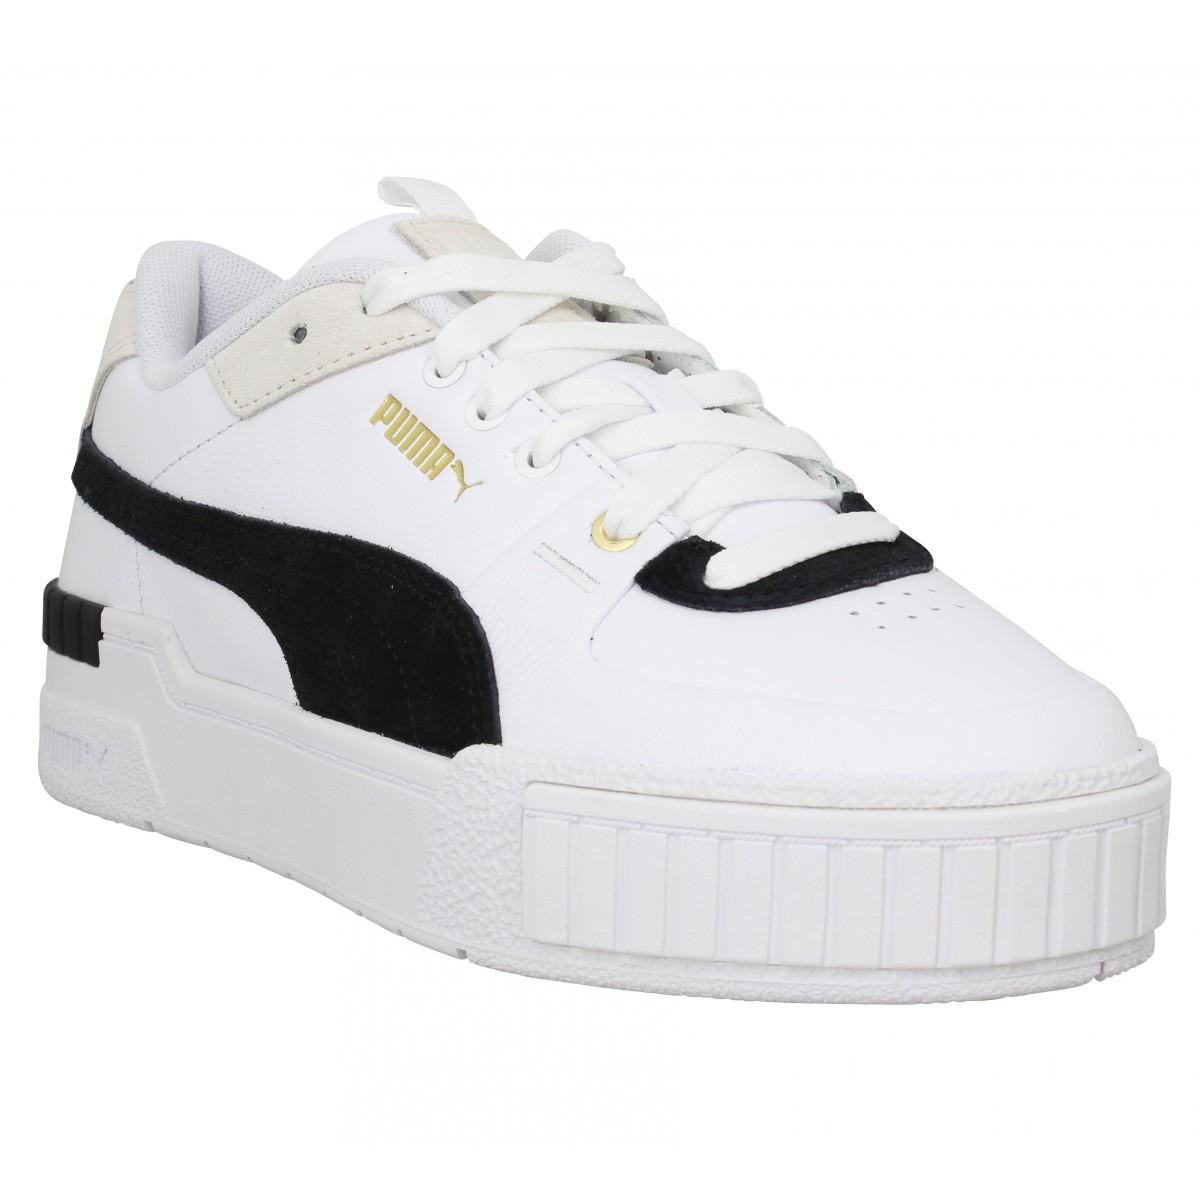 chaussures femme puma cali